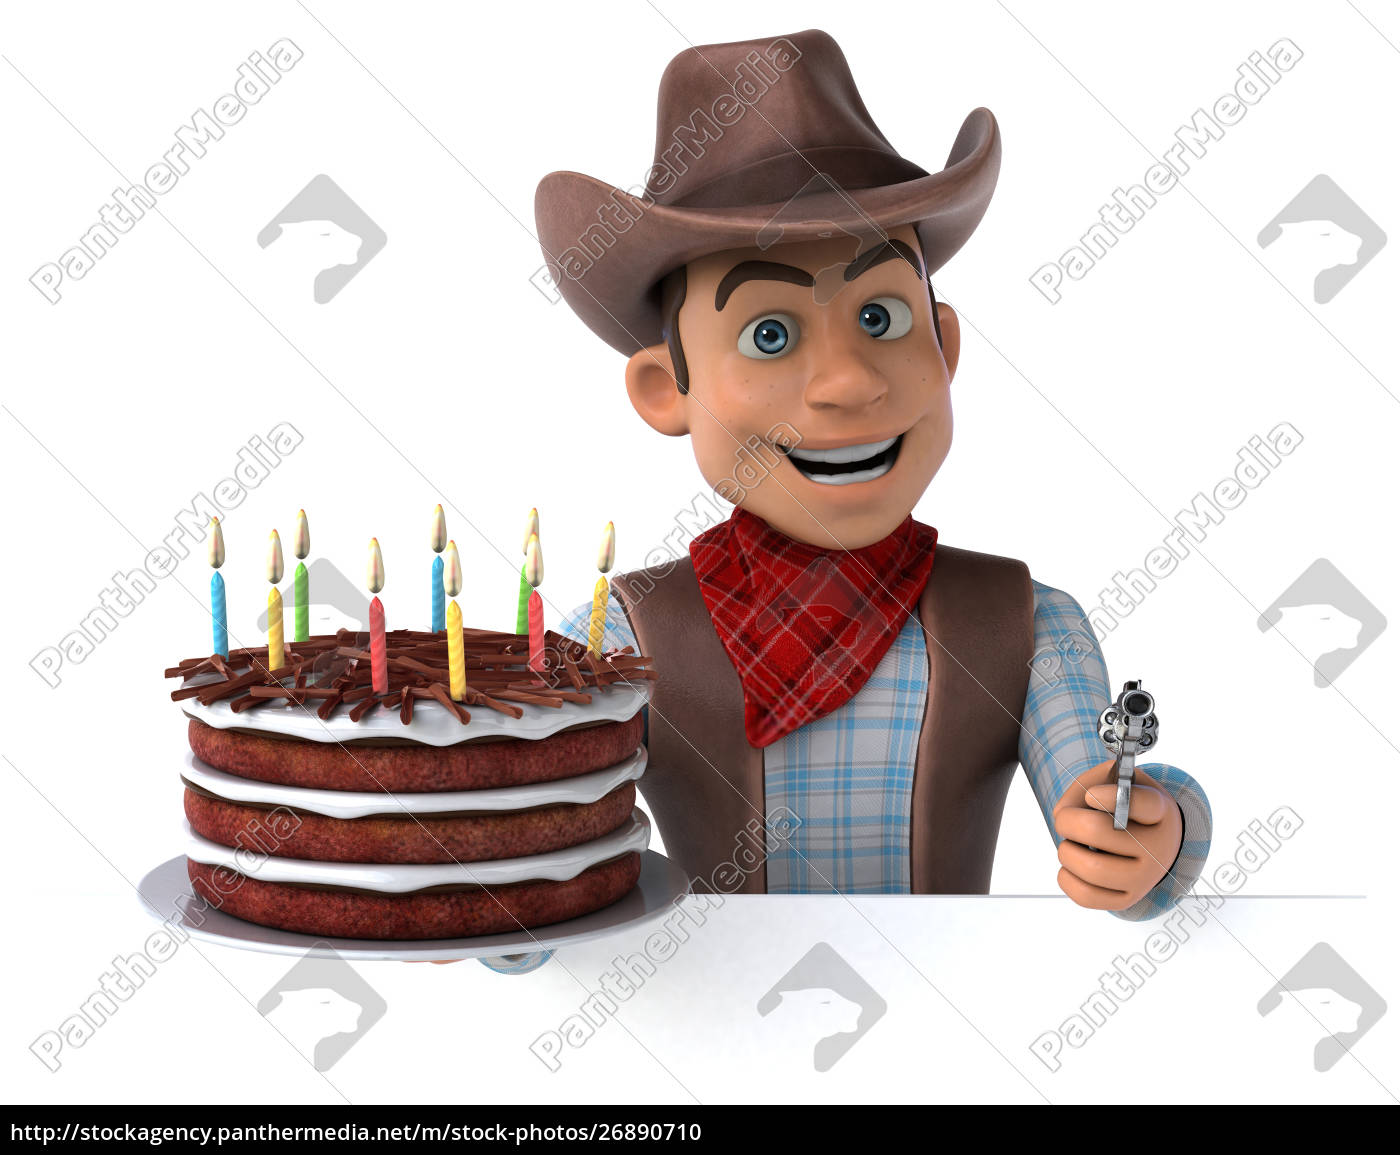 fun, cowboy, -, 3d, illustration - 26890710